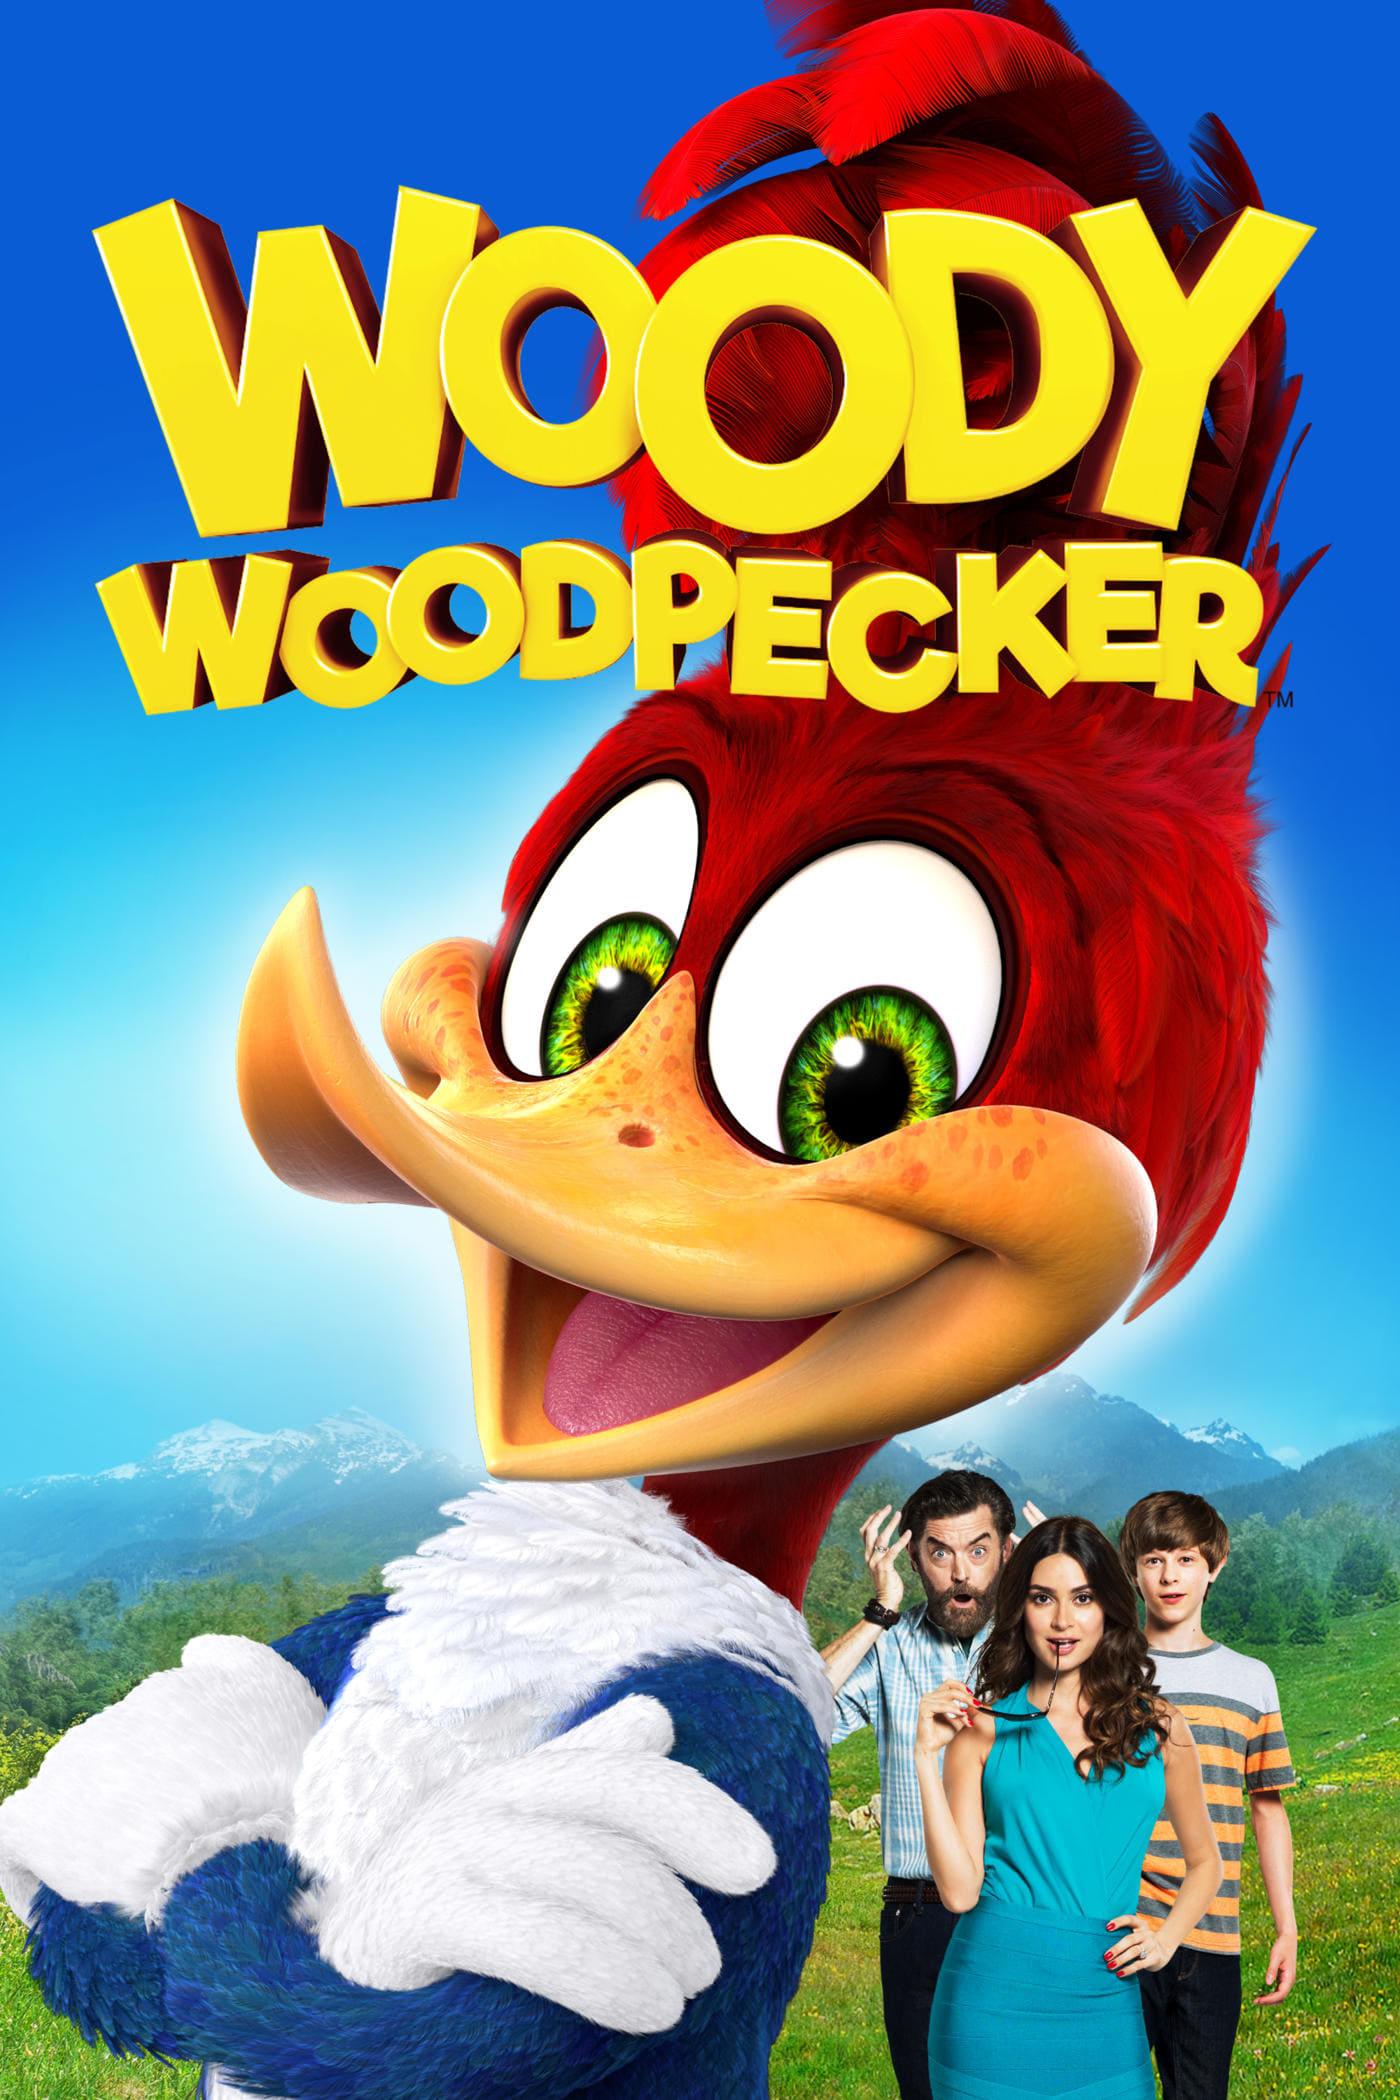 Woodsman s woody